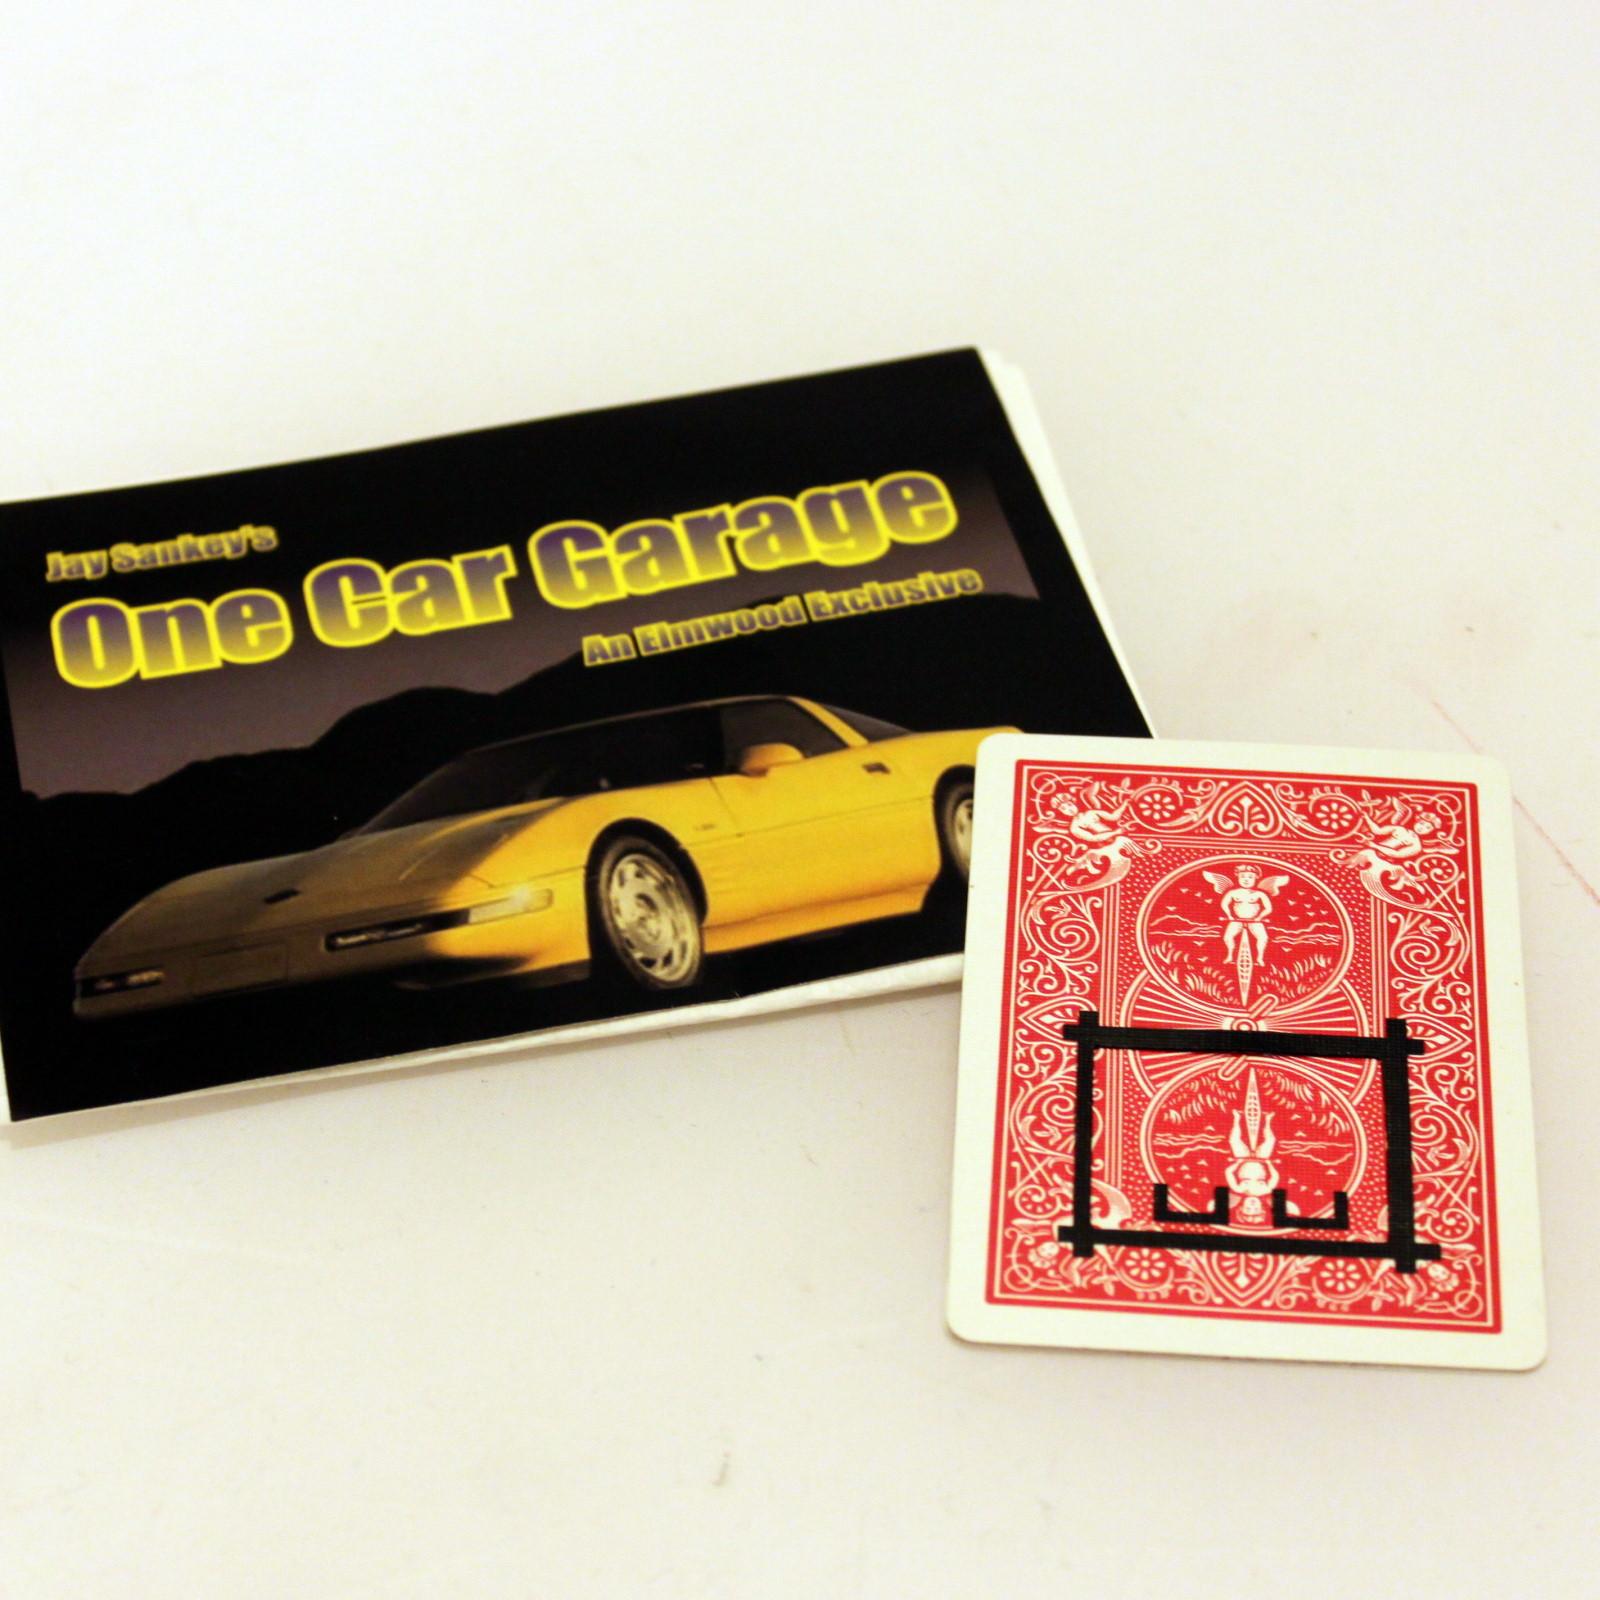 Once Car Garage by Jay Sankey